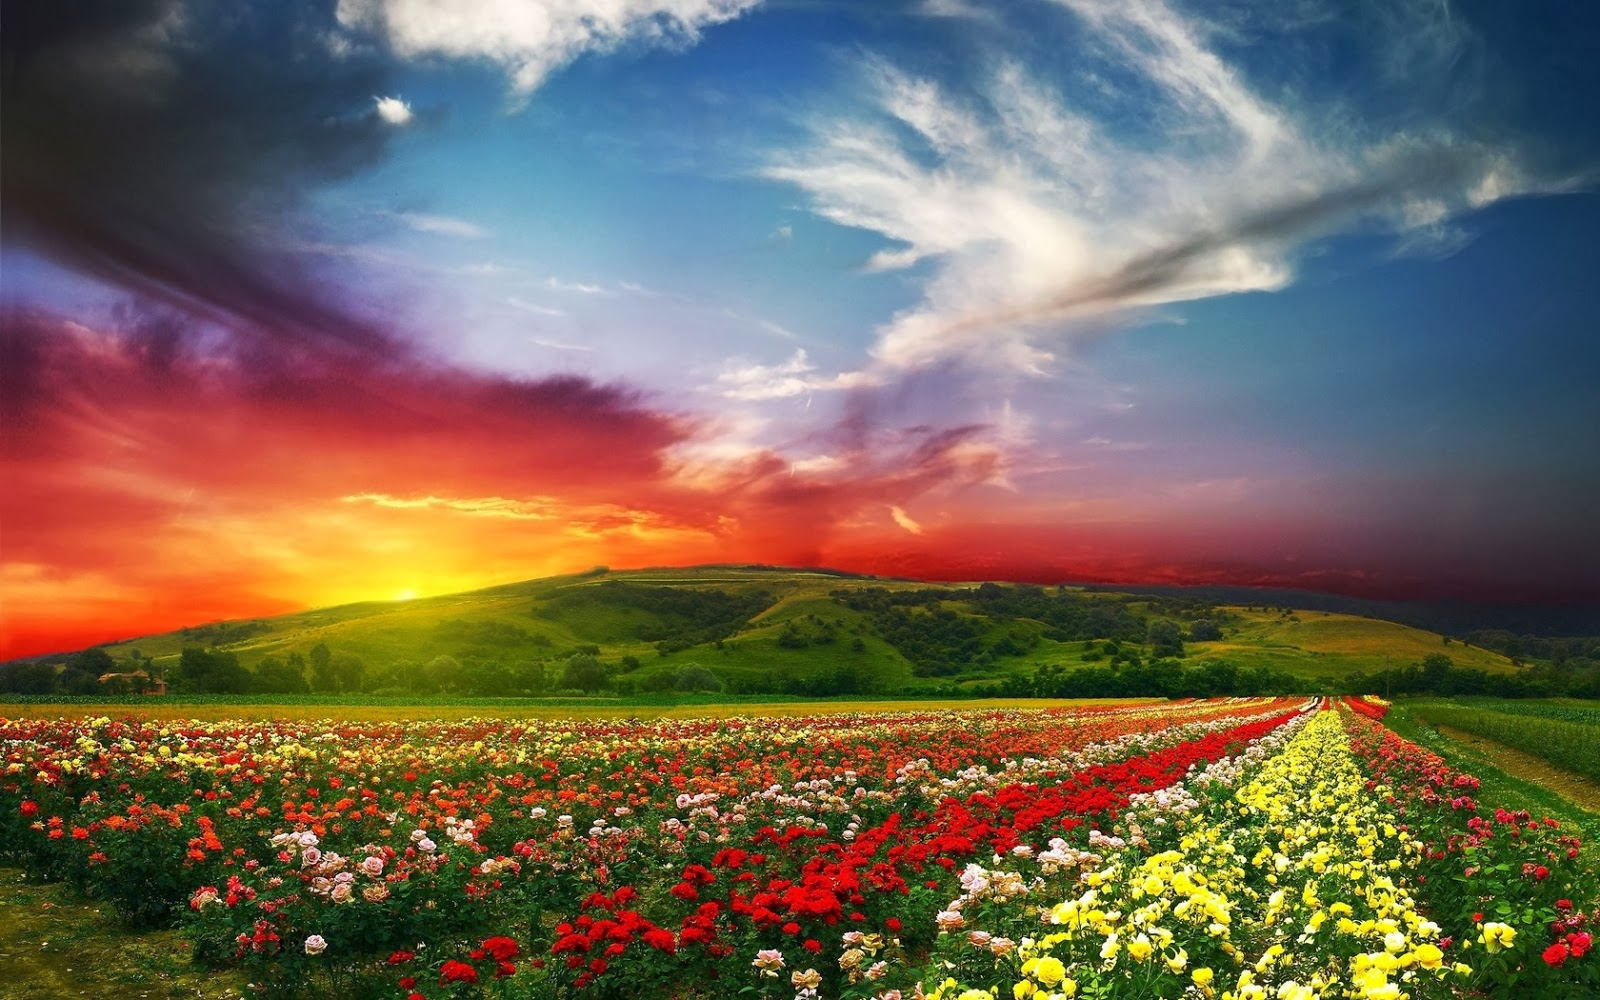 http://2.bp.blogspot.com/-SlE_F9PXVso/UrCBvMEsJGI/AAAAAAAAUIo/PozZQuAUW_U/s1600/paisaje-naturaleza-flores-bellas.jpg